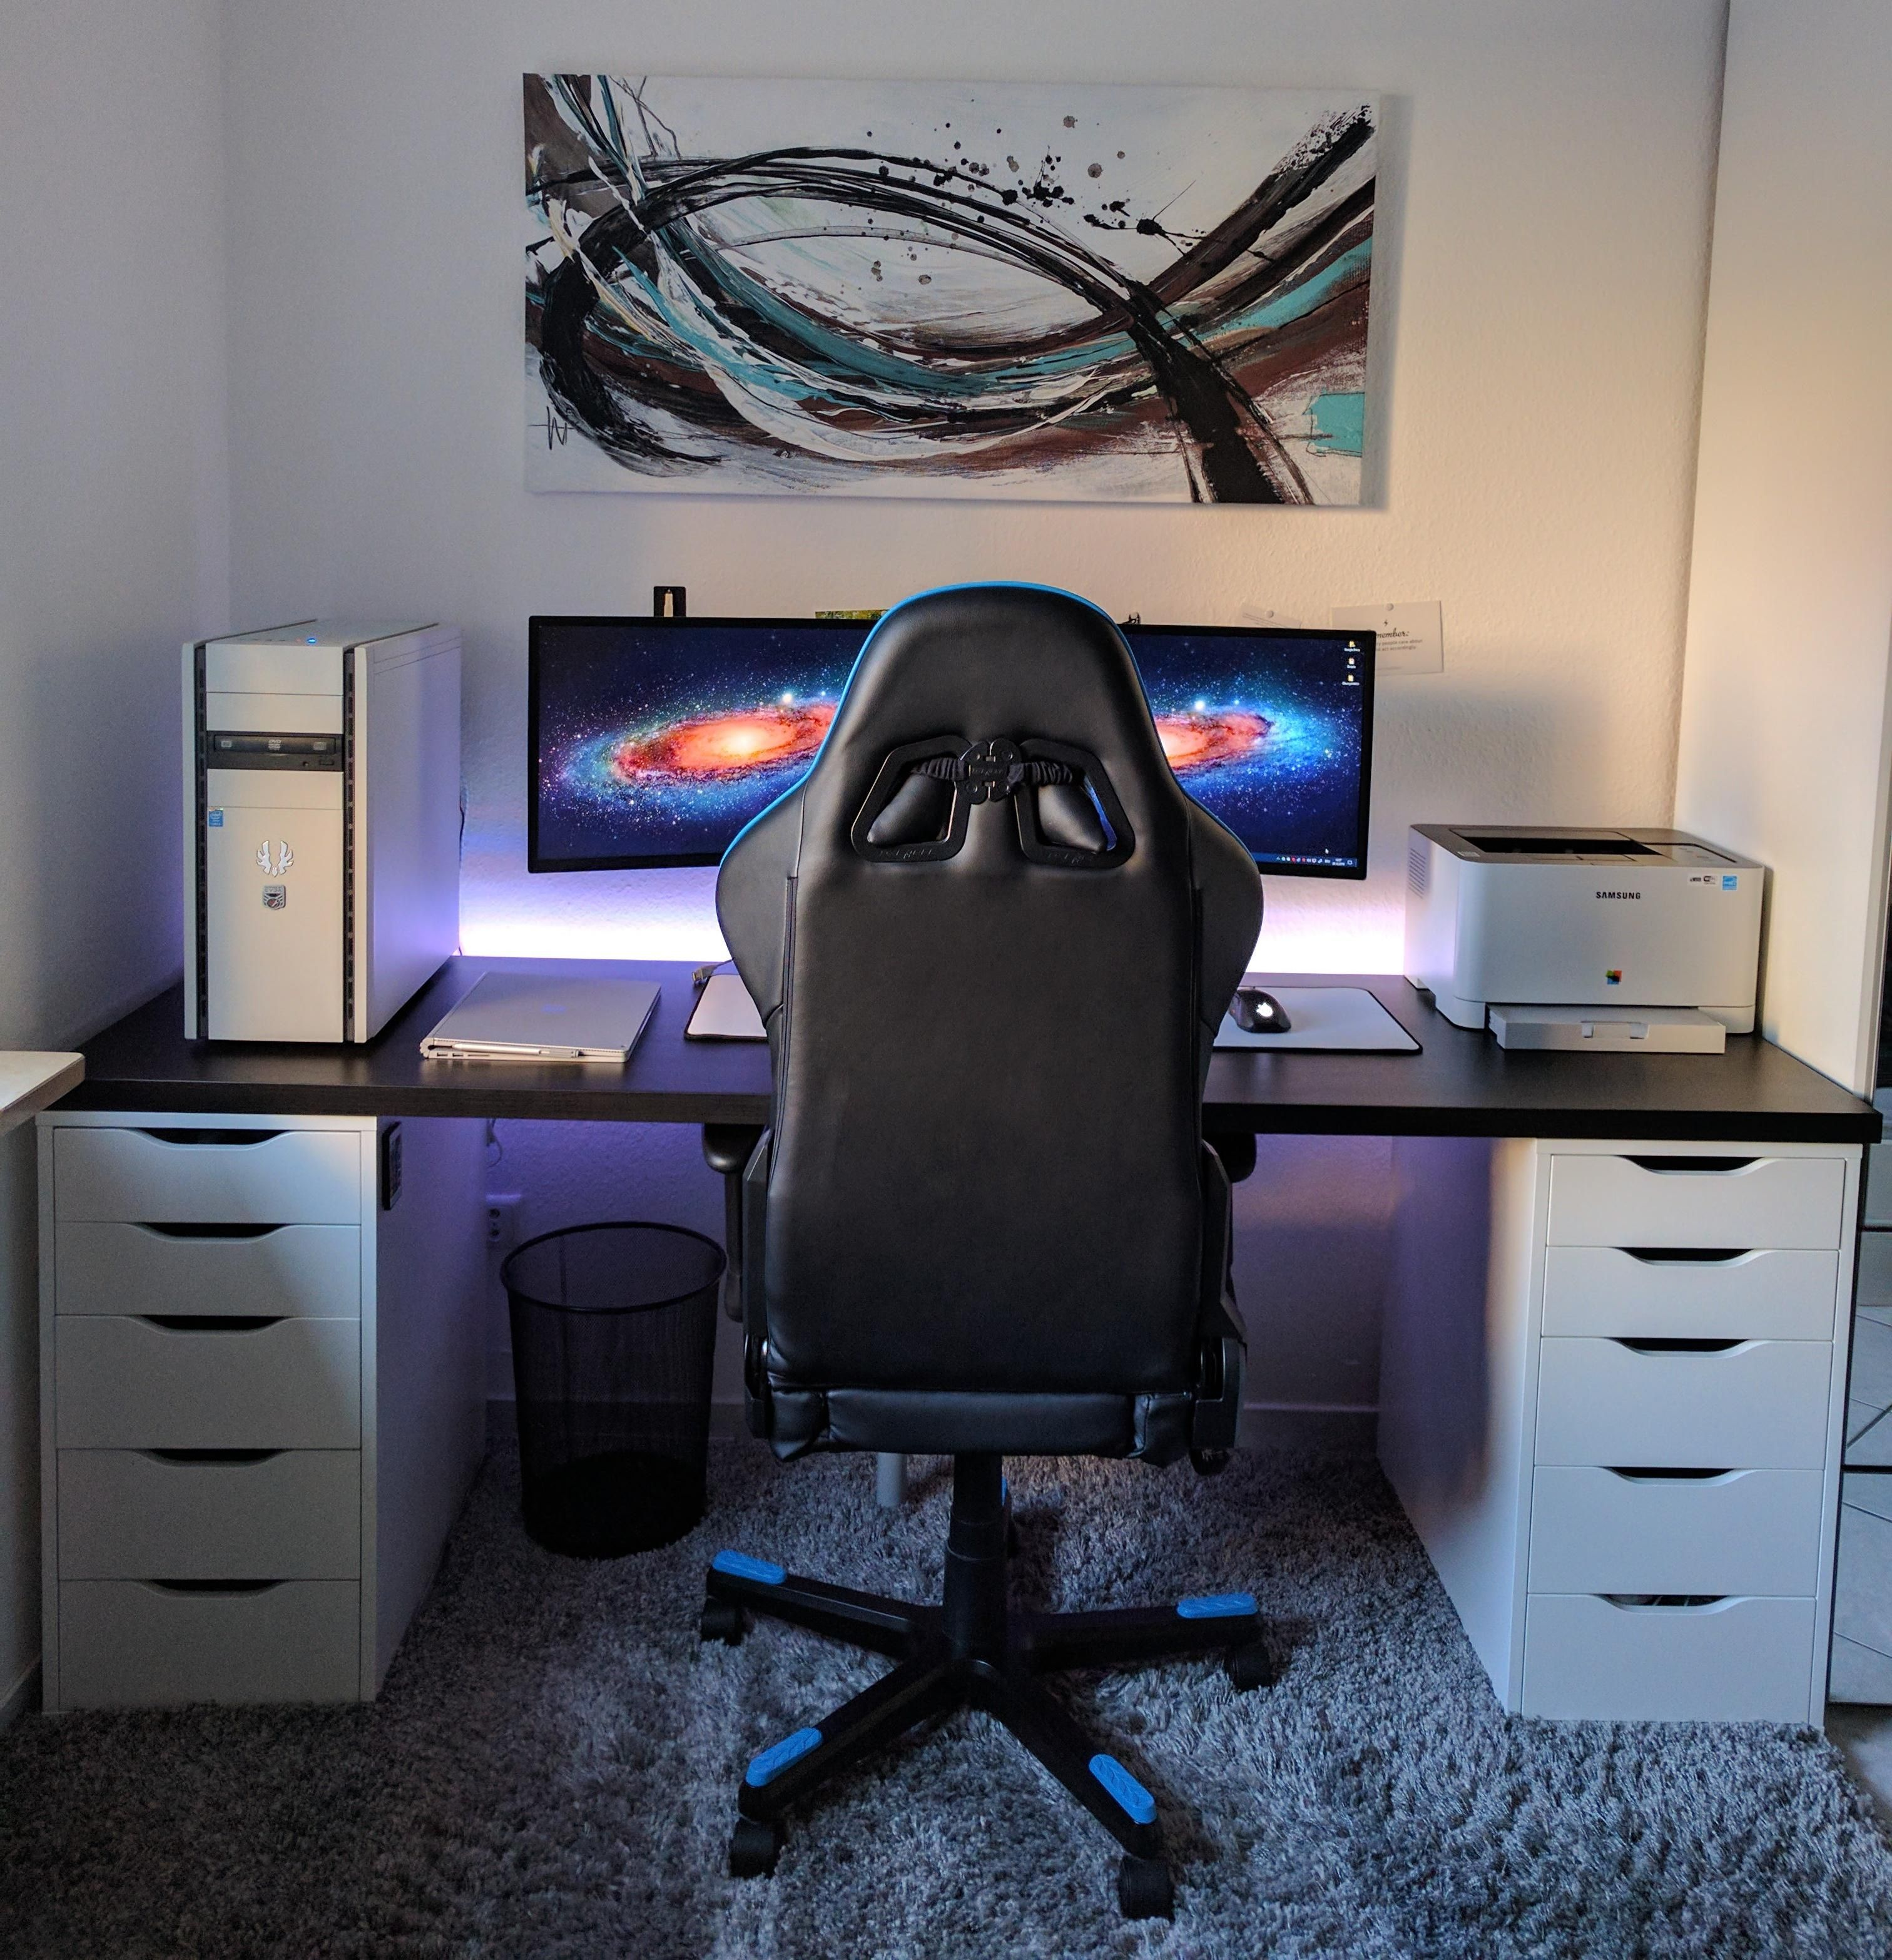 University battlestation december 2016 upgrade bedroom - Home office setup ideas ...